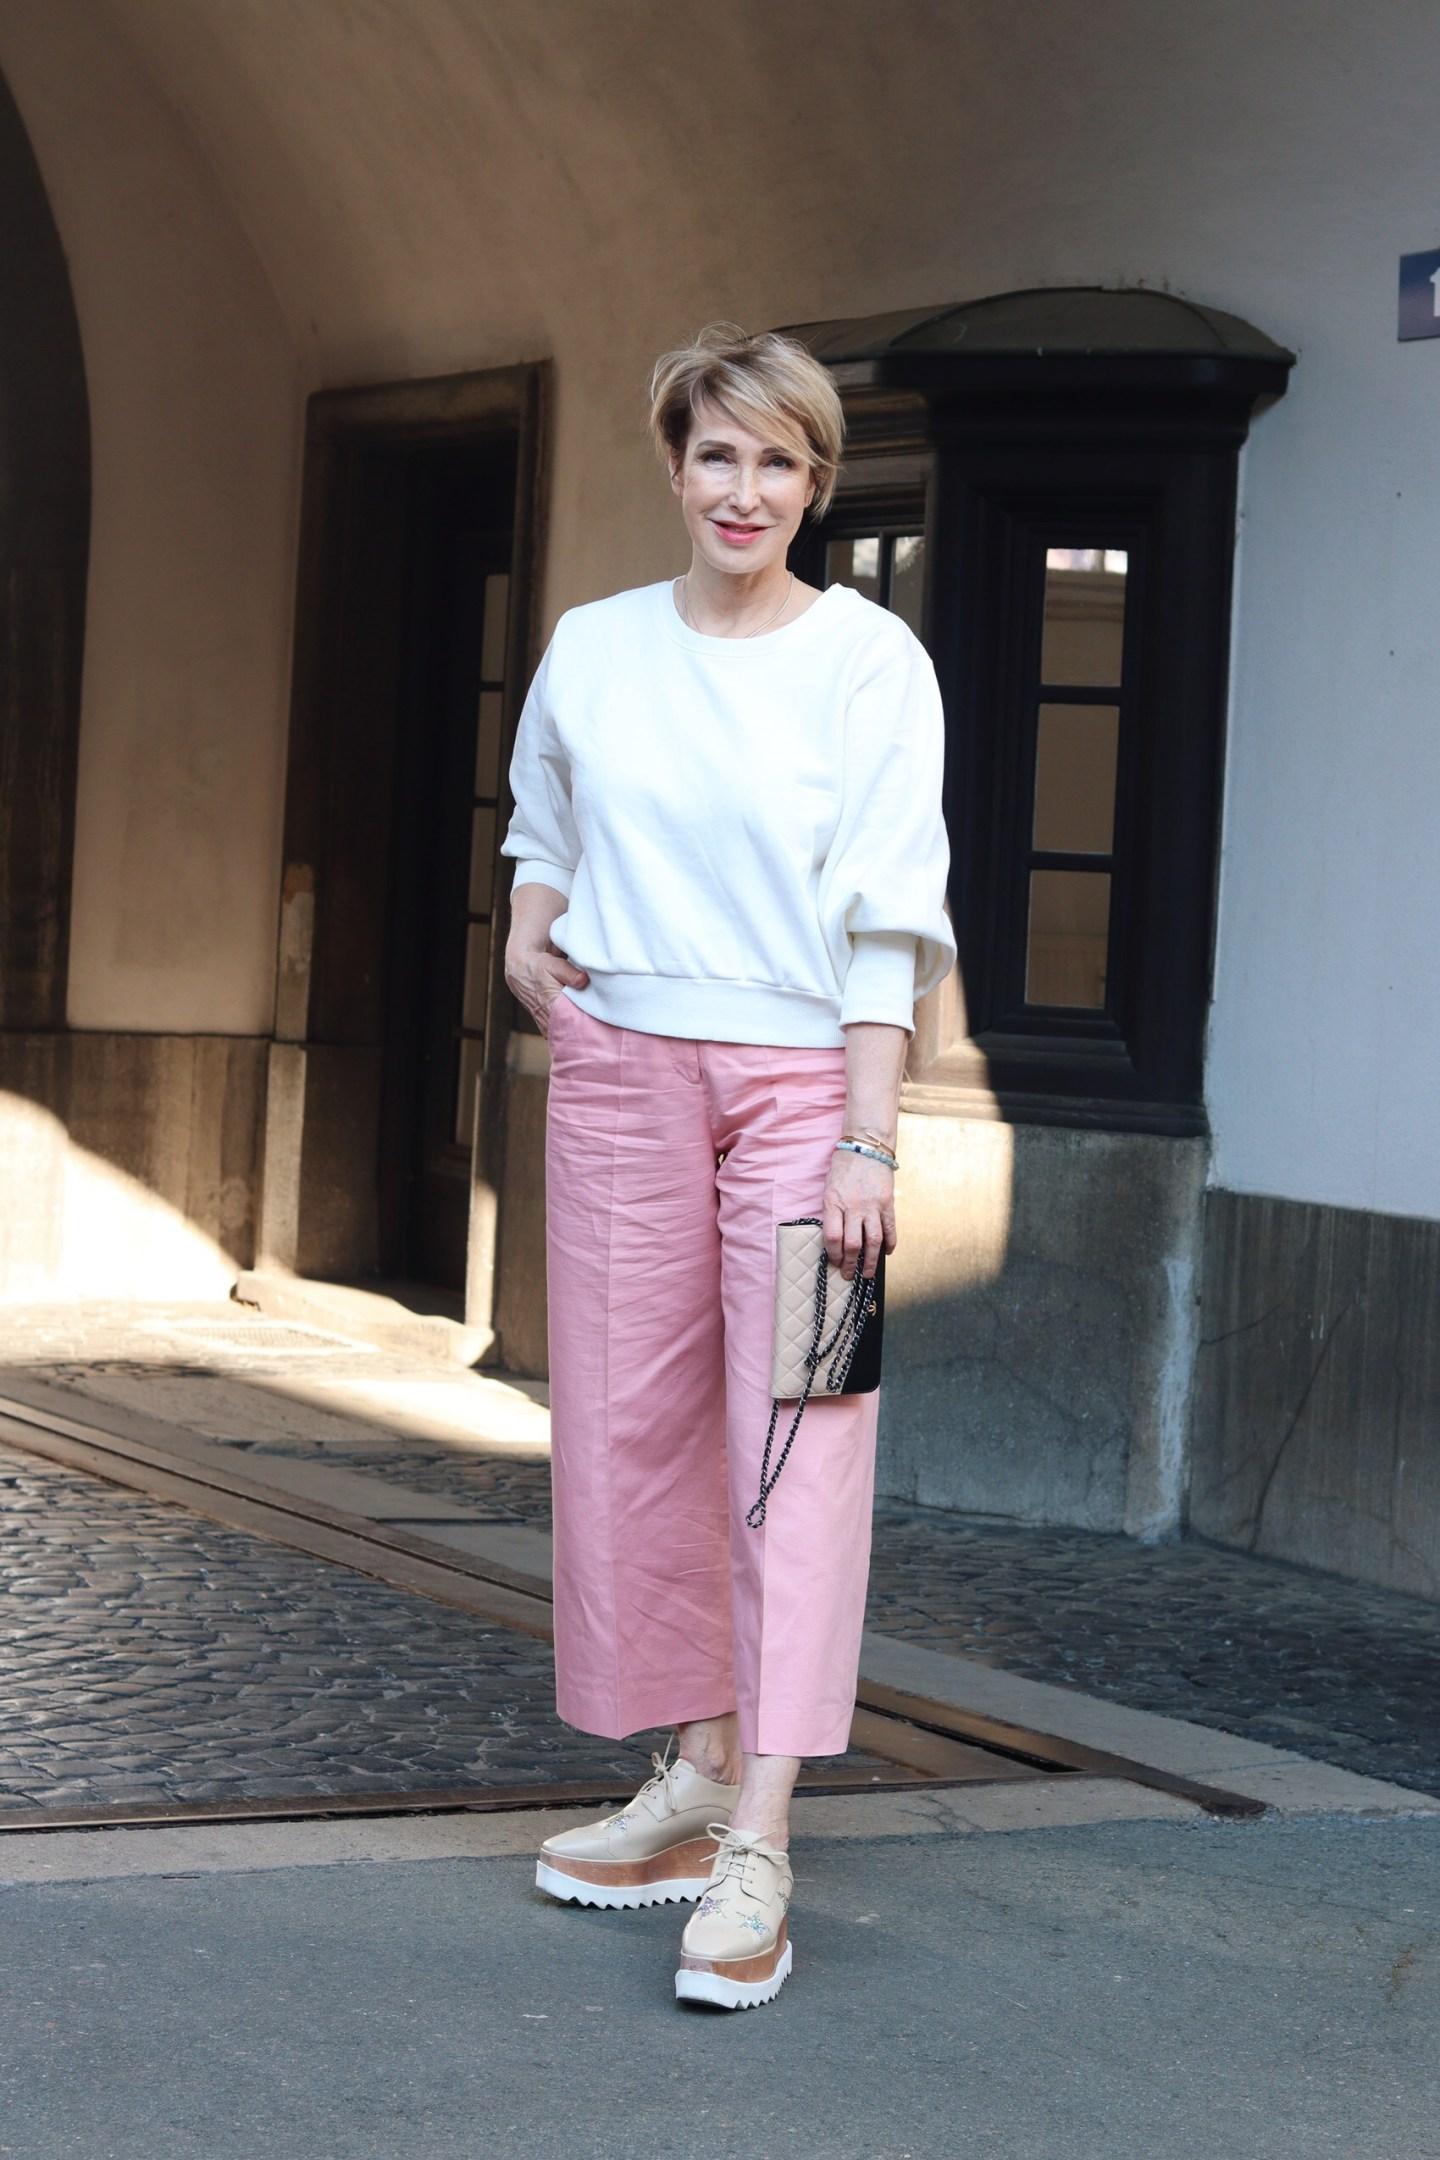 glamupyourlifestyle ue-40-mode ue-50-mode stella-Mccartney-Schuhe Fashion-Bloggerin